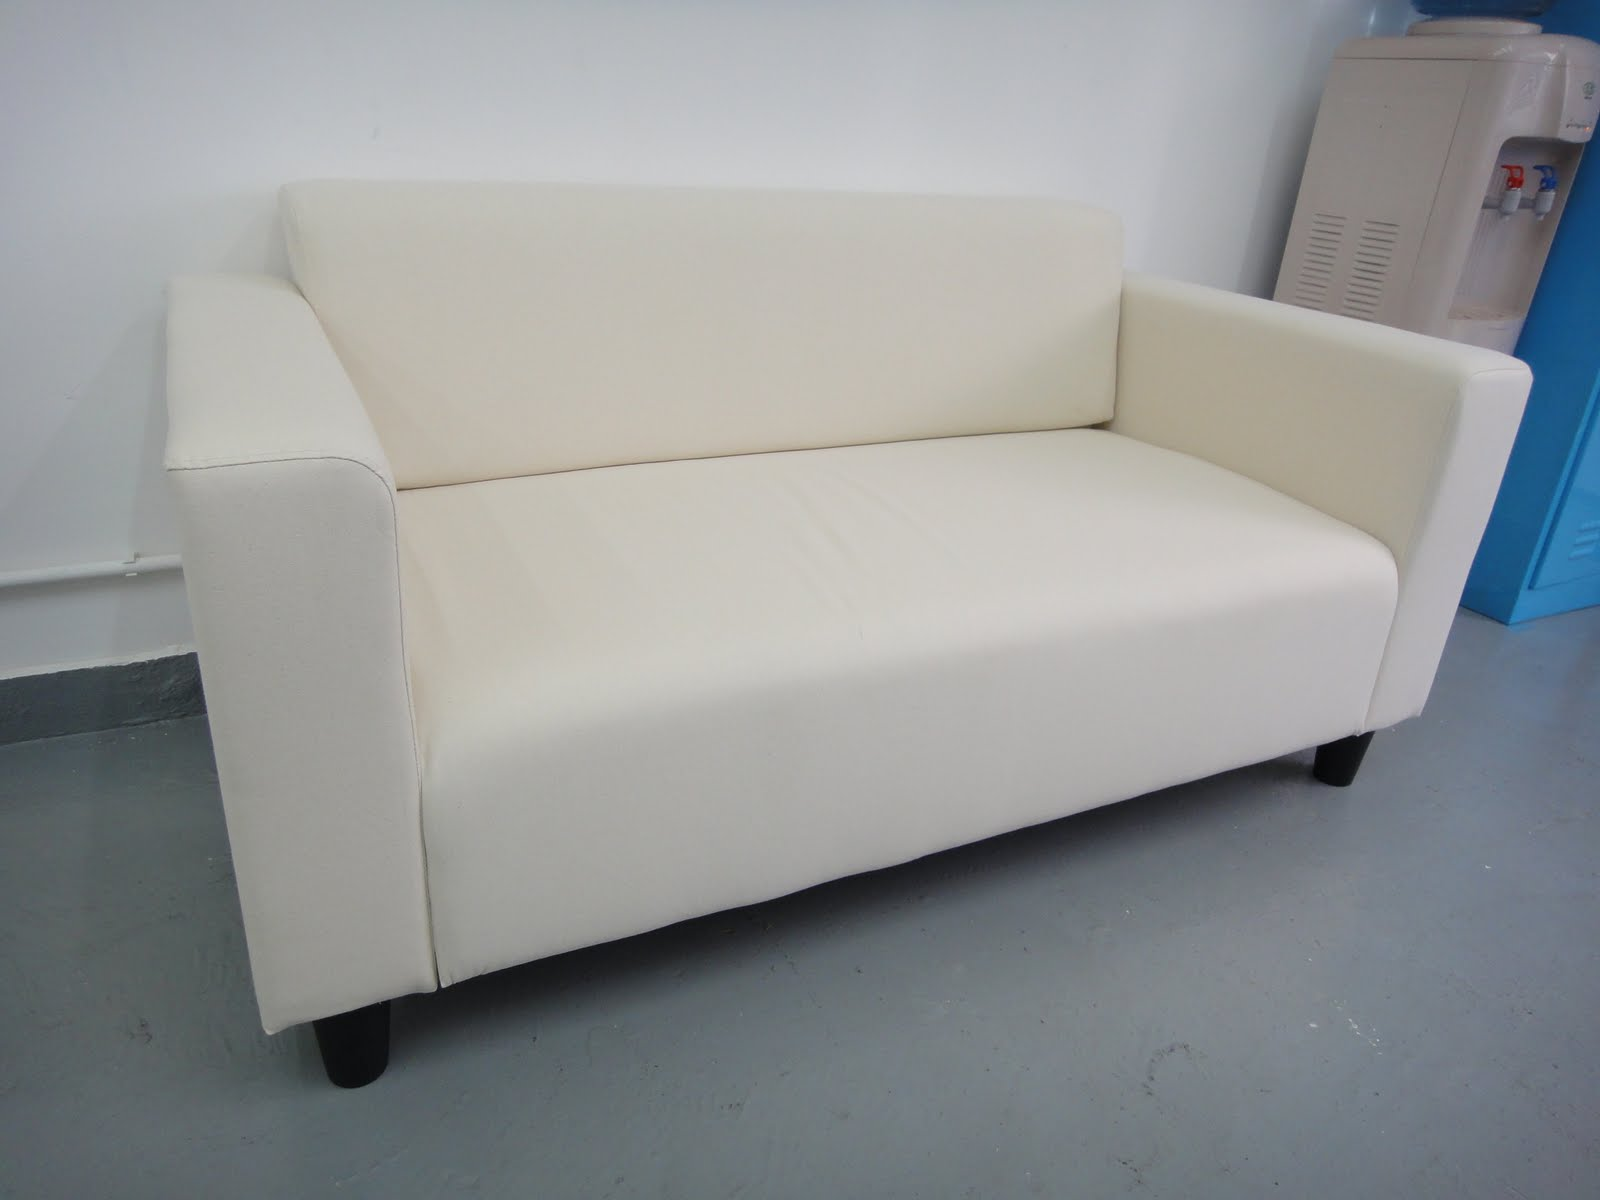 jacqueline sofa saskia 3 seater 2 set foxcliff and water machine office